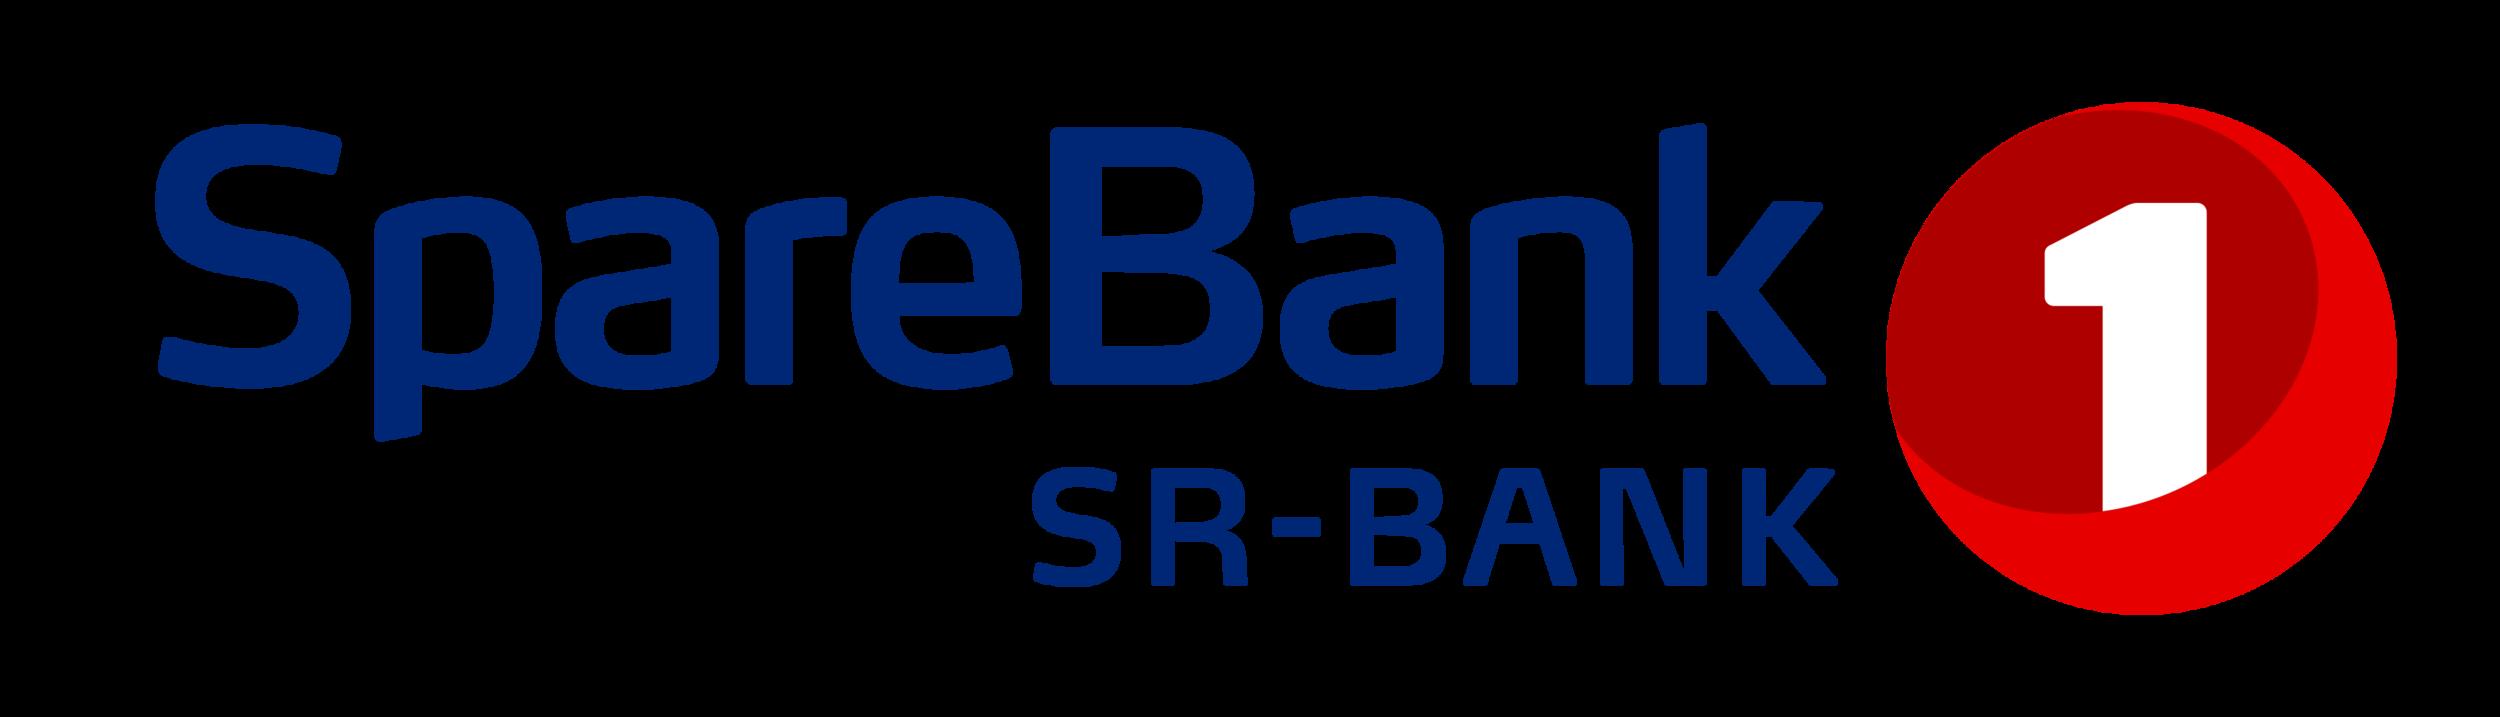 rgb_SB1_SRBank_verti_pos.png